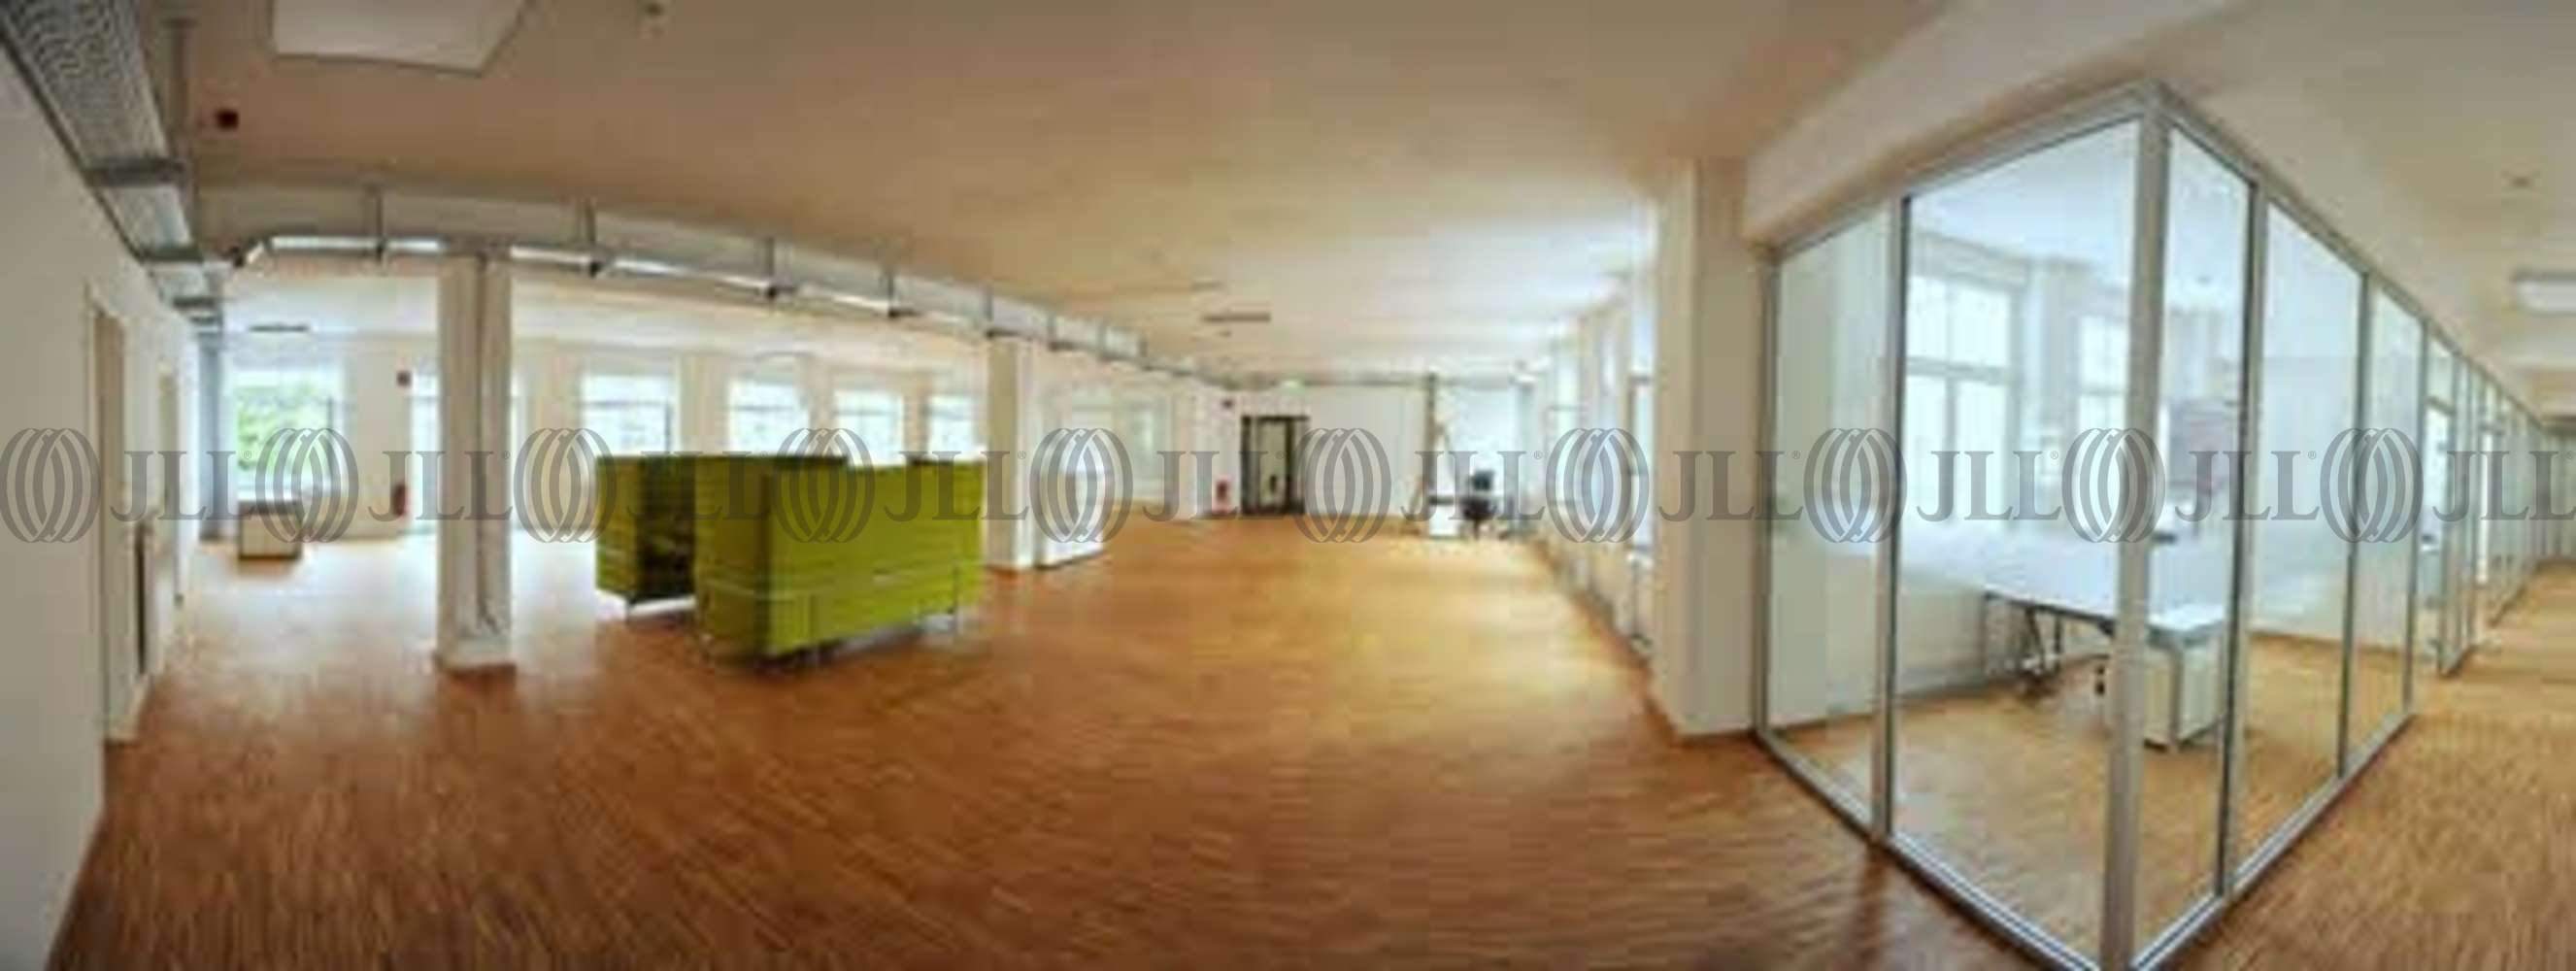 Büros Nürnberg, 90419 - Büro - Nürnberg, St Johannis - M1192 - 10604795